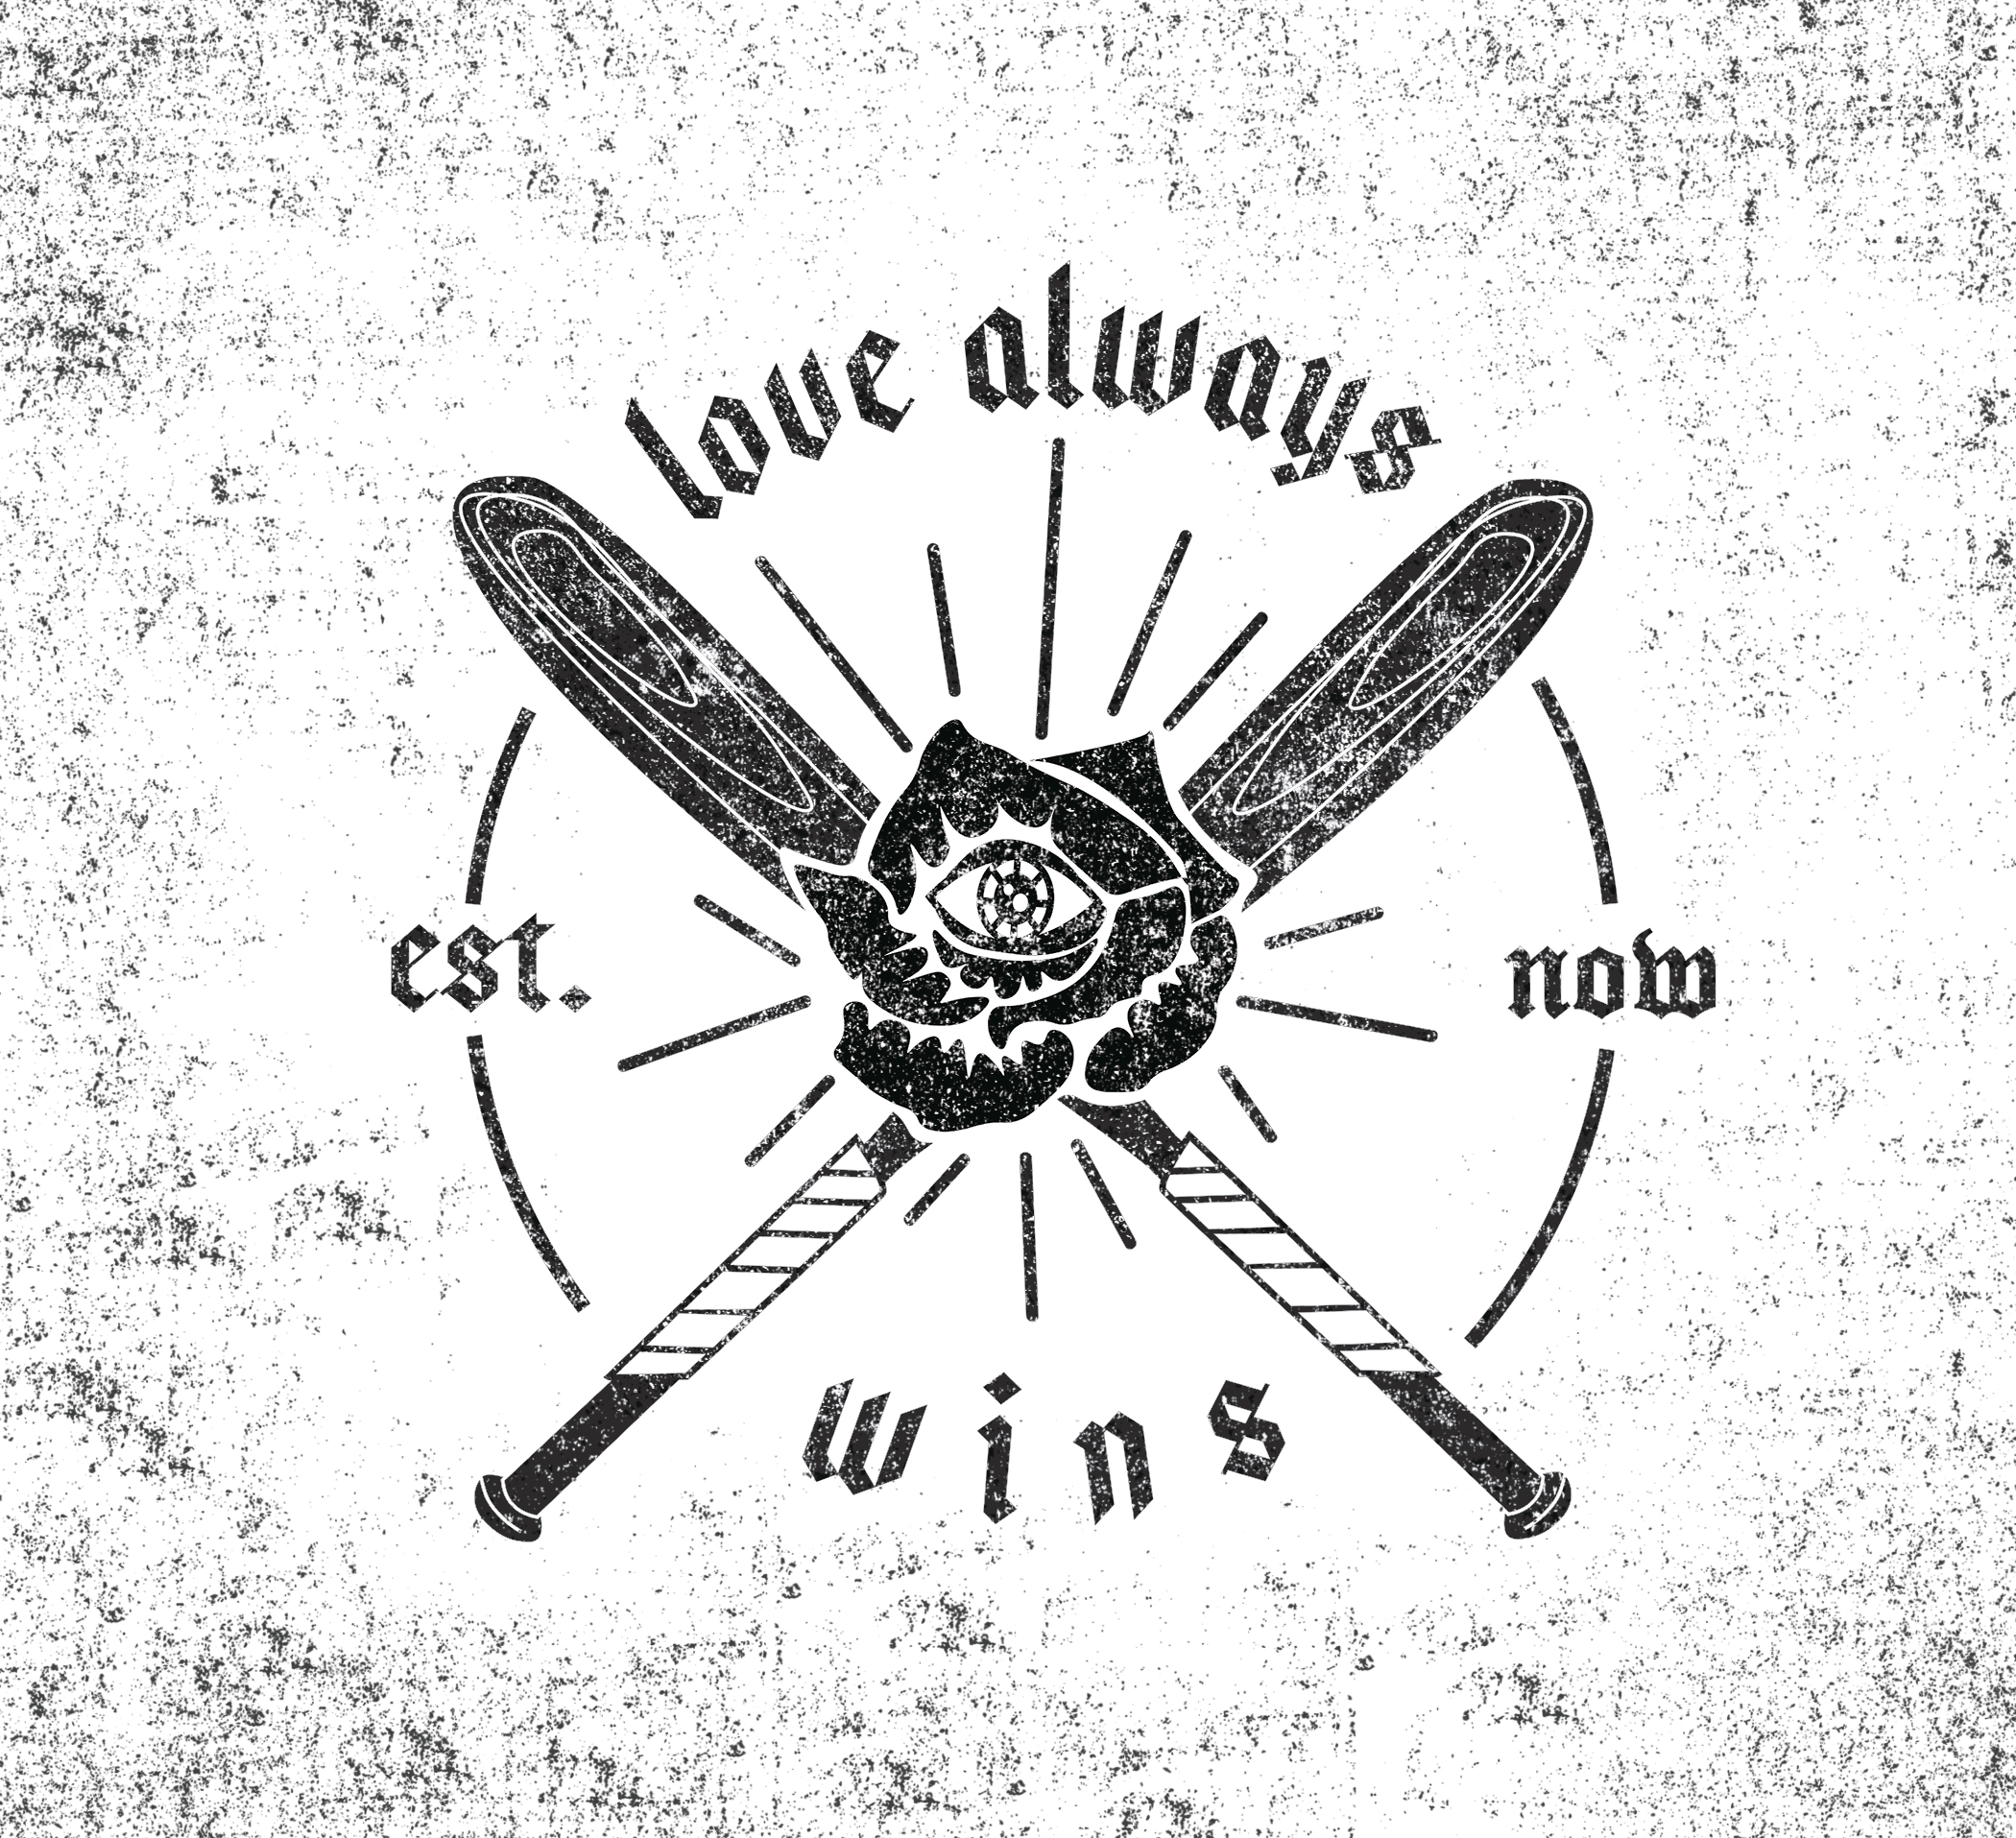 lovealwayswins-01.jpg